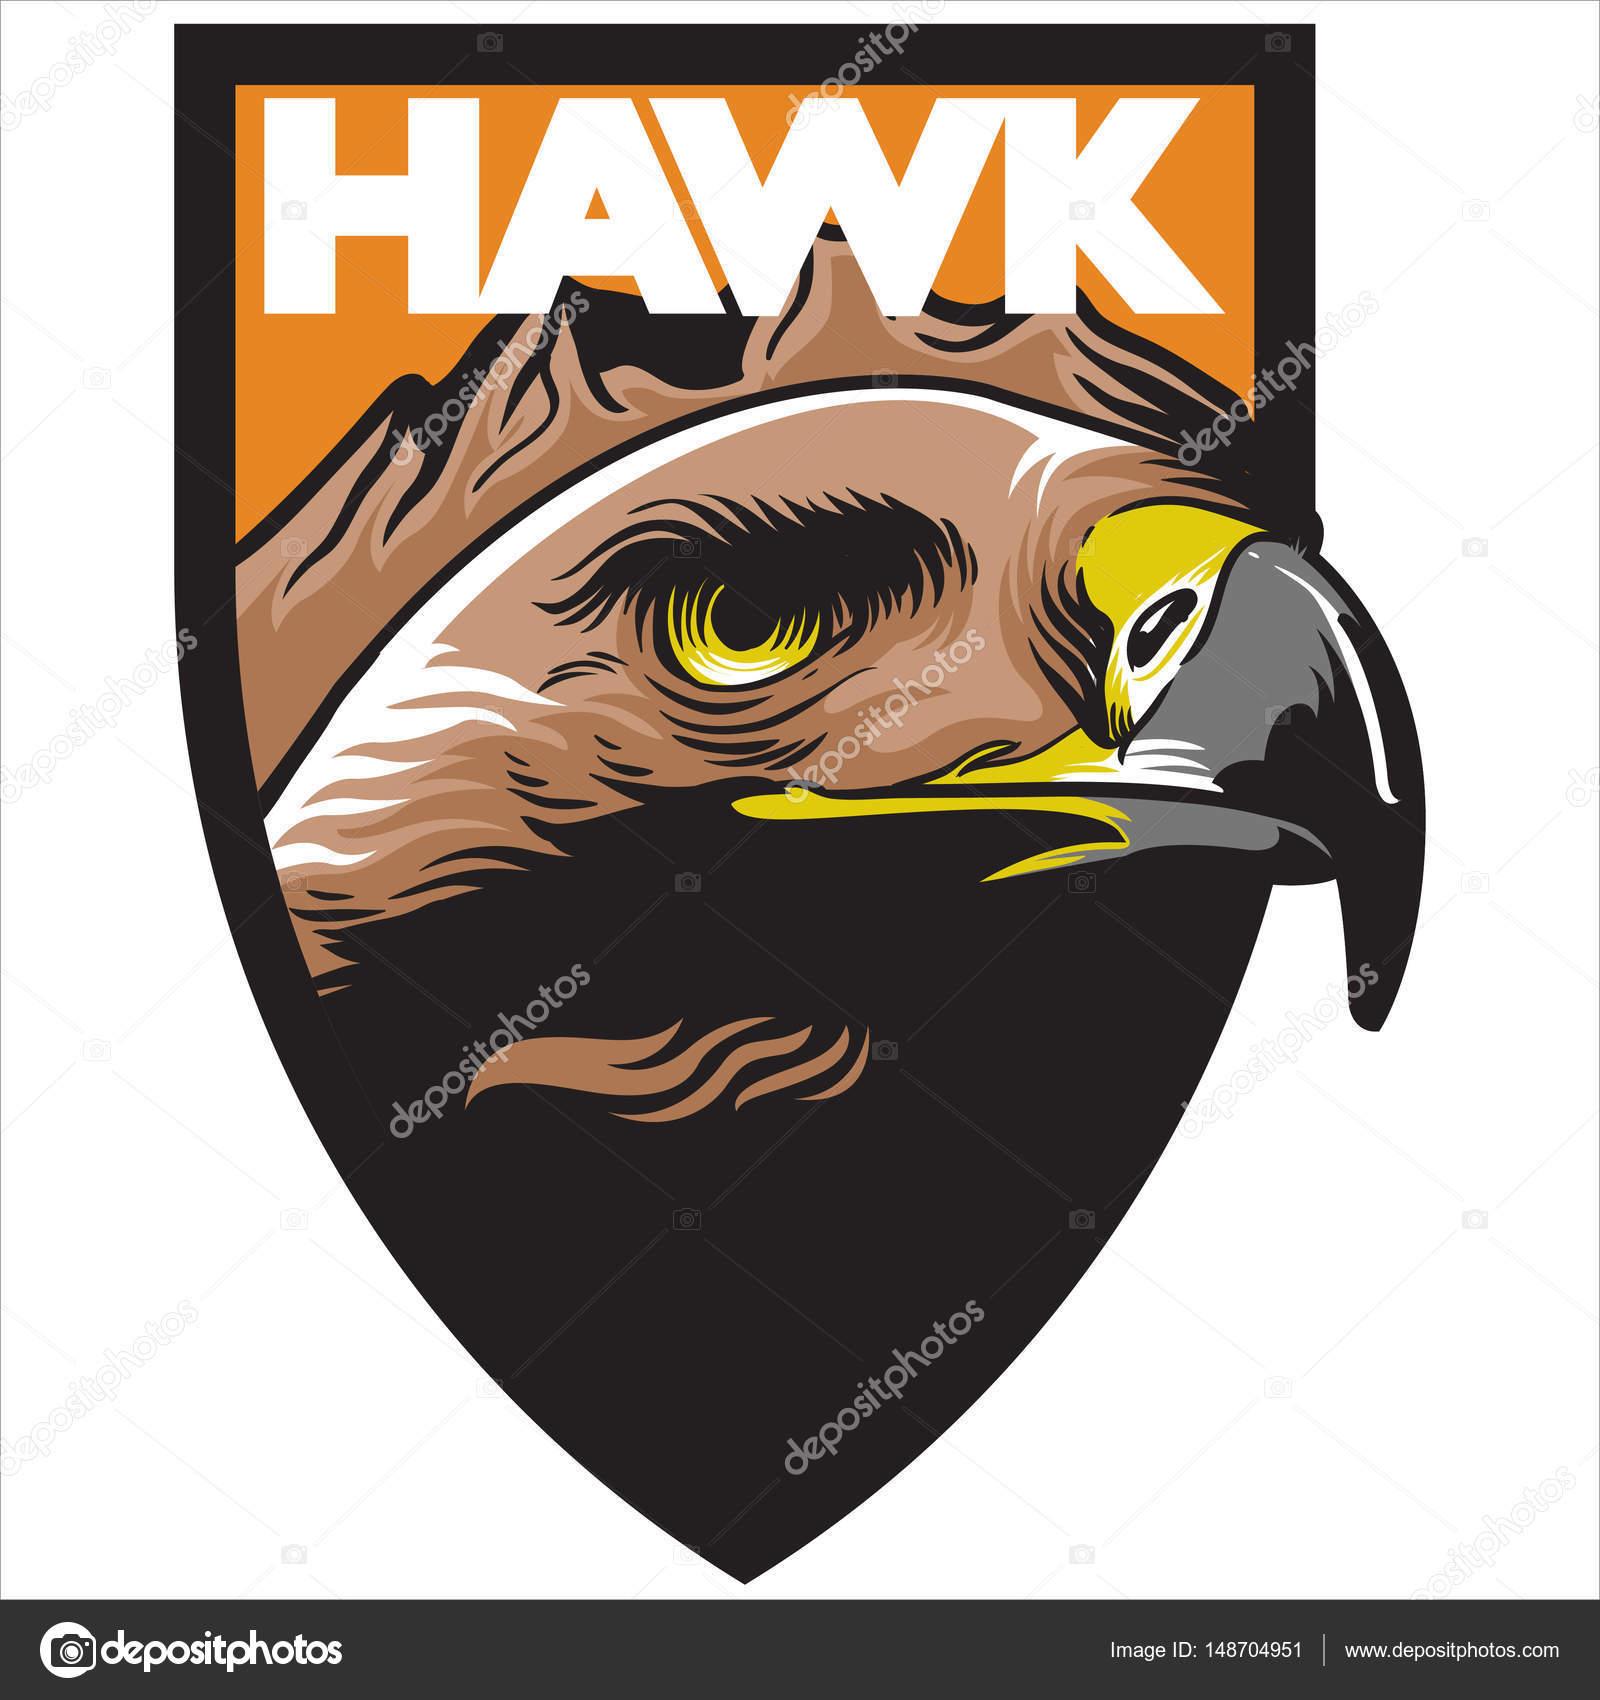 Portfolio Ironstone72 Stock Photos Illustrations And Vector Art Bald Eagle Diagram Golden Related Keywords Suggestions Hawk Orange Background Mascot Logo